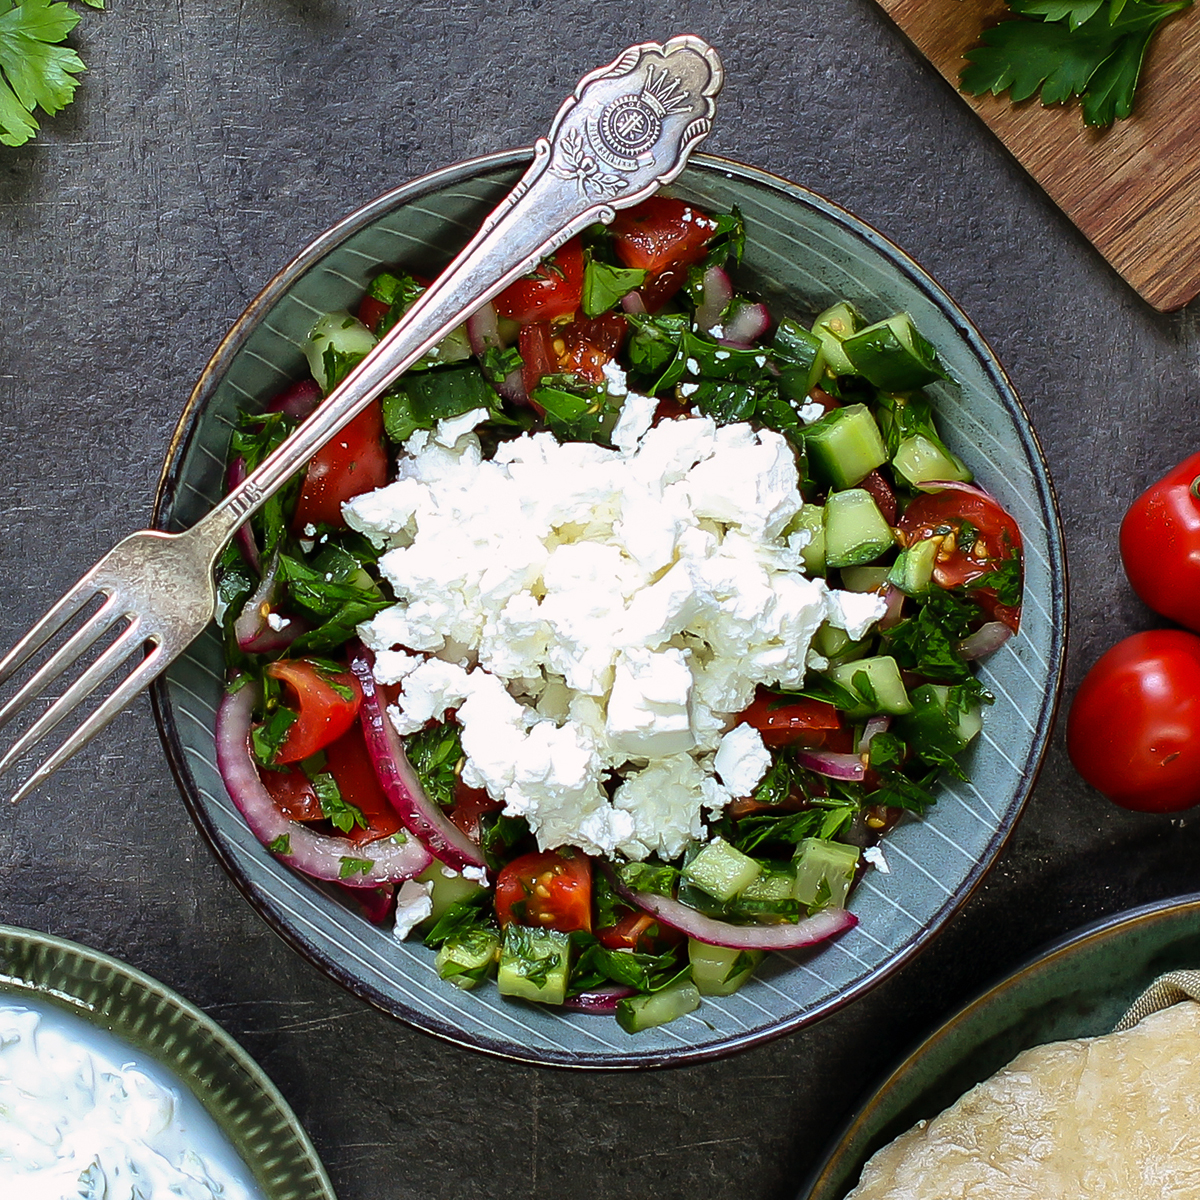 hakket tyrkisk salat med tomat, agurk og fetaost